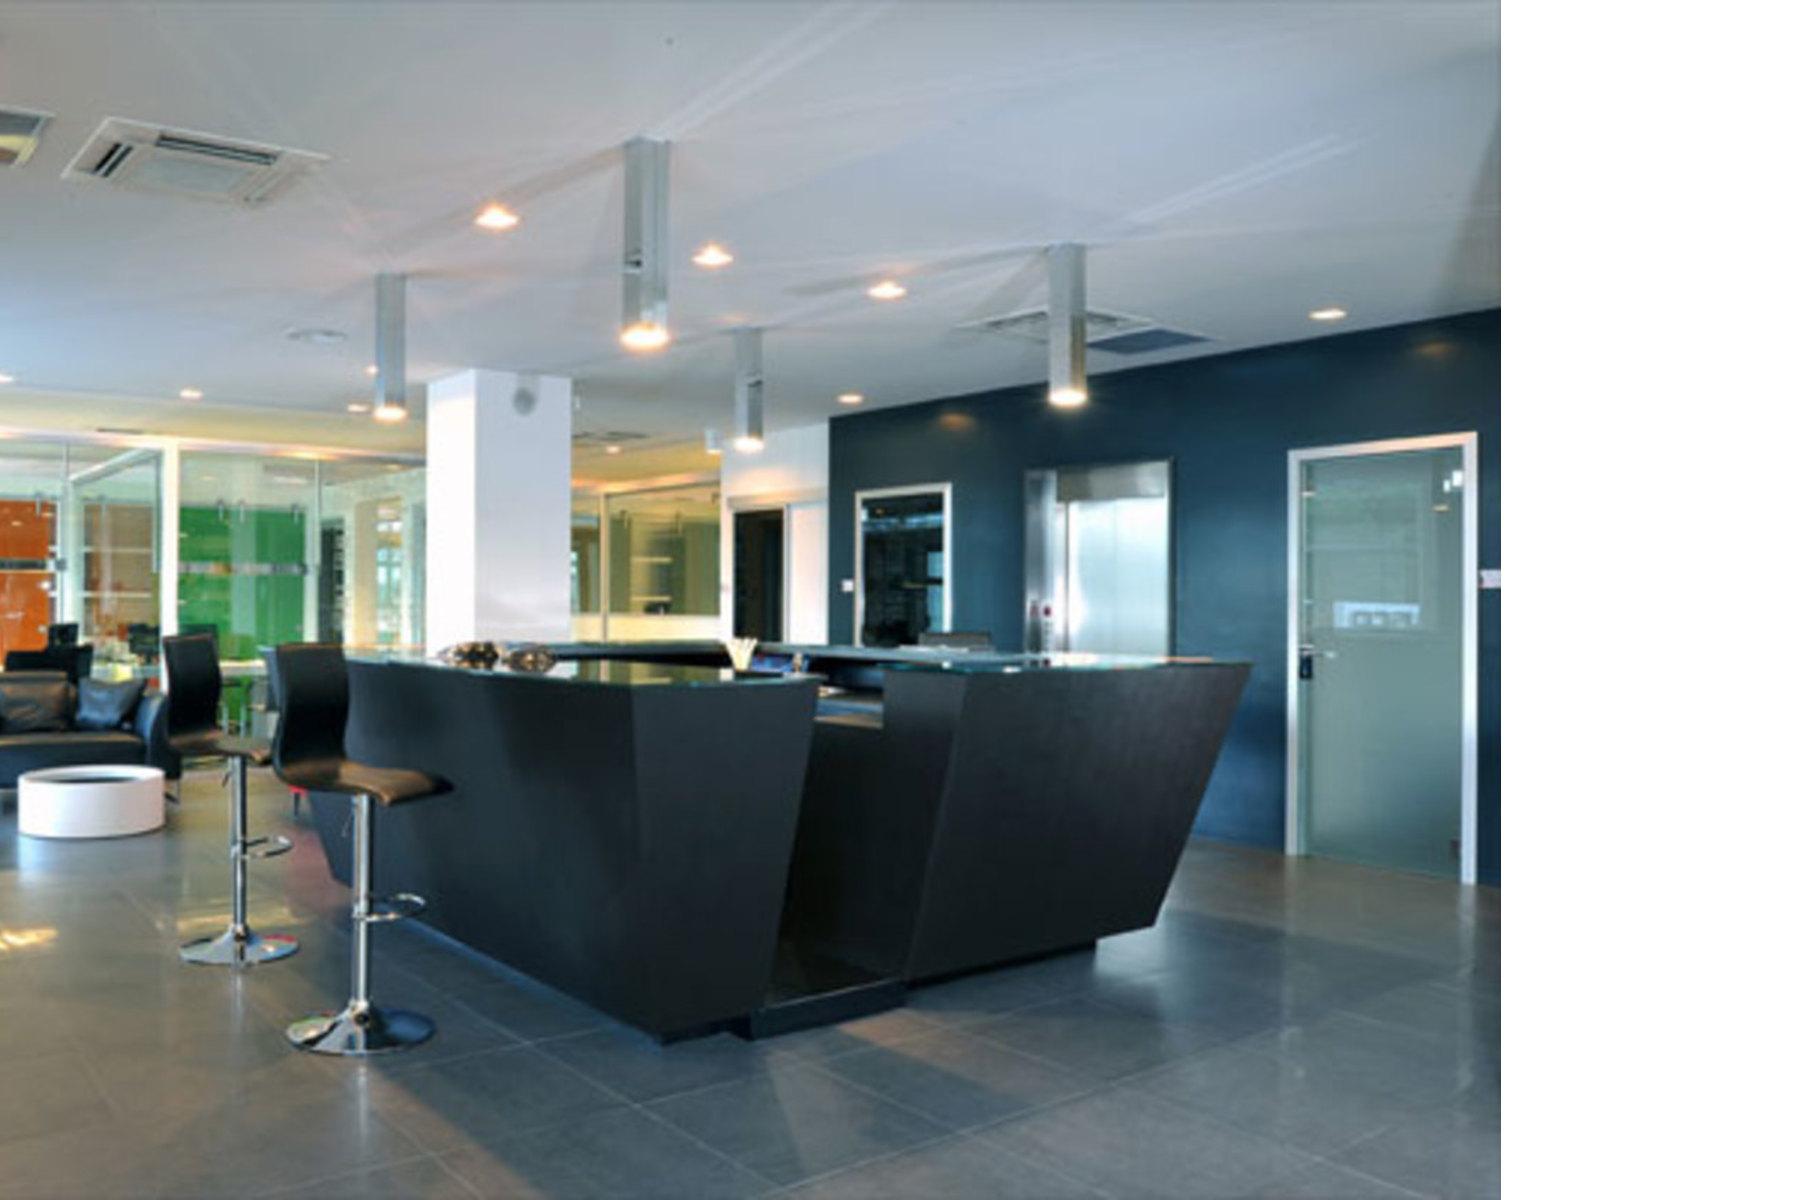 New nusco porte showroom floornature - Nusco porte milano ...